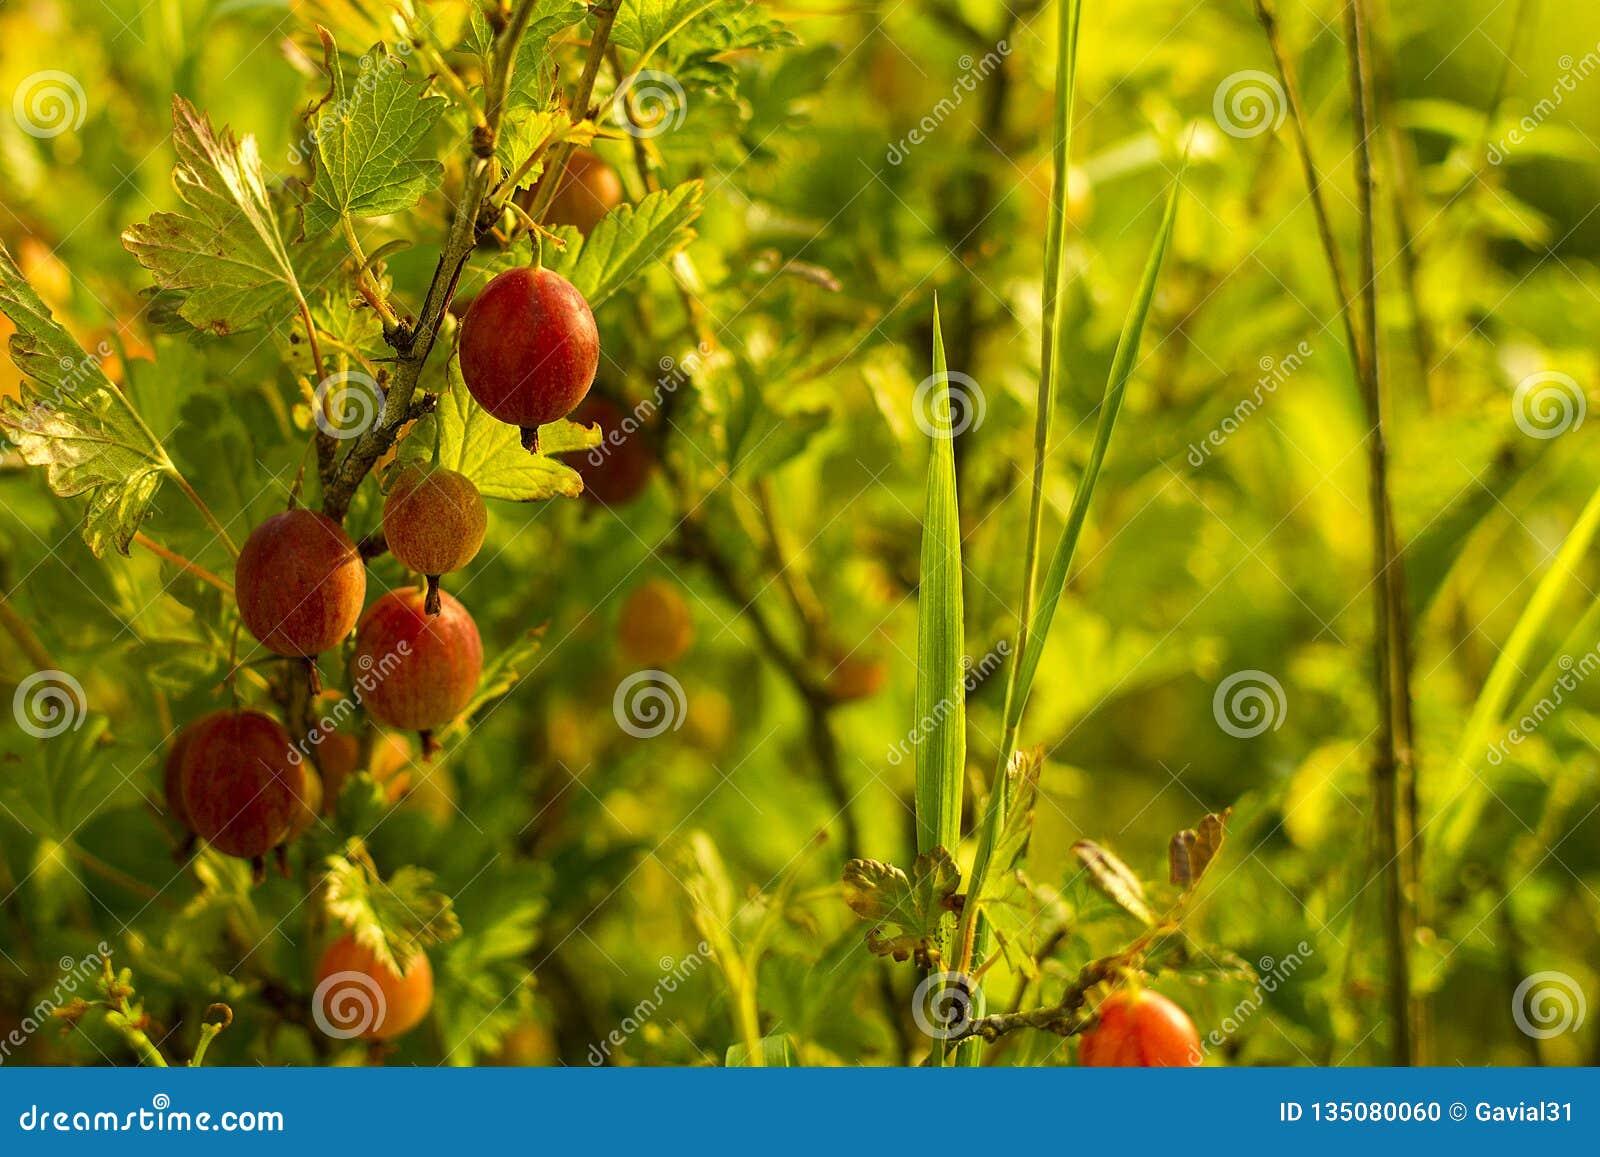 Fresh gooseberries on a branch of gooseberry bush with sunlight.